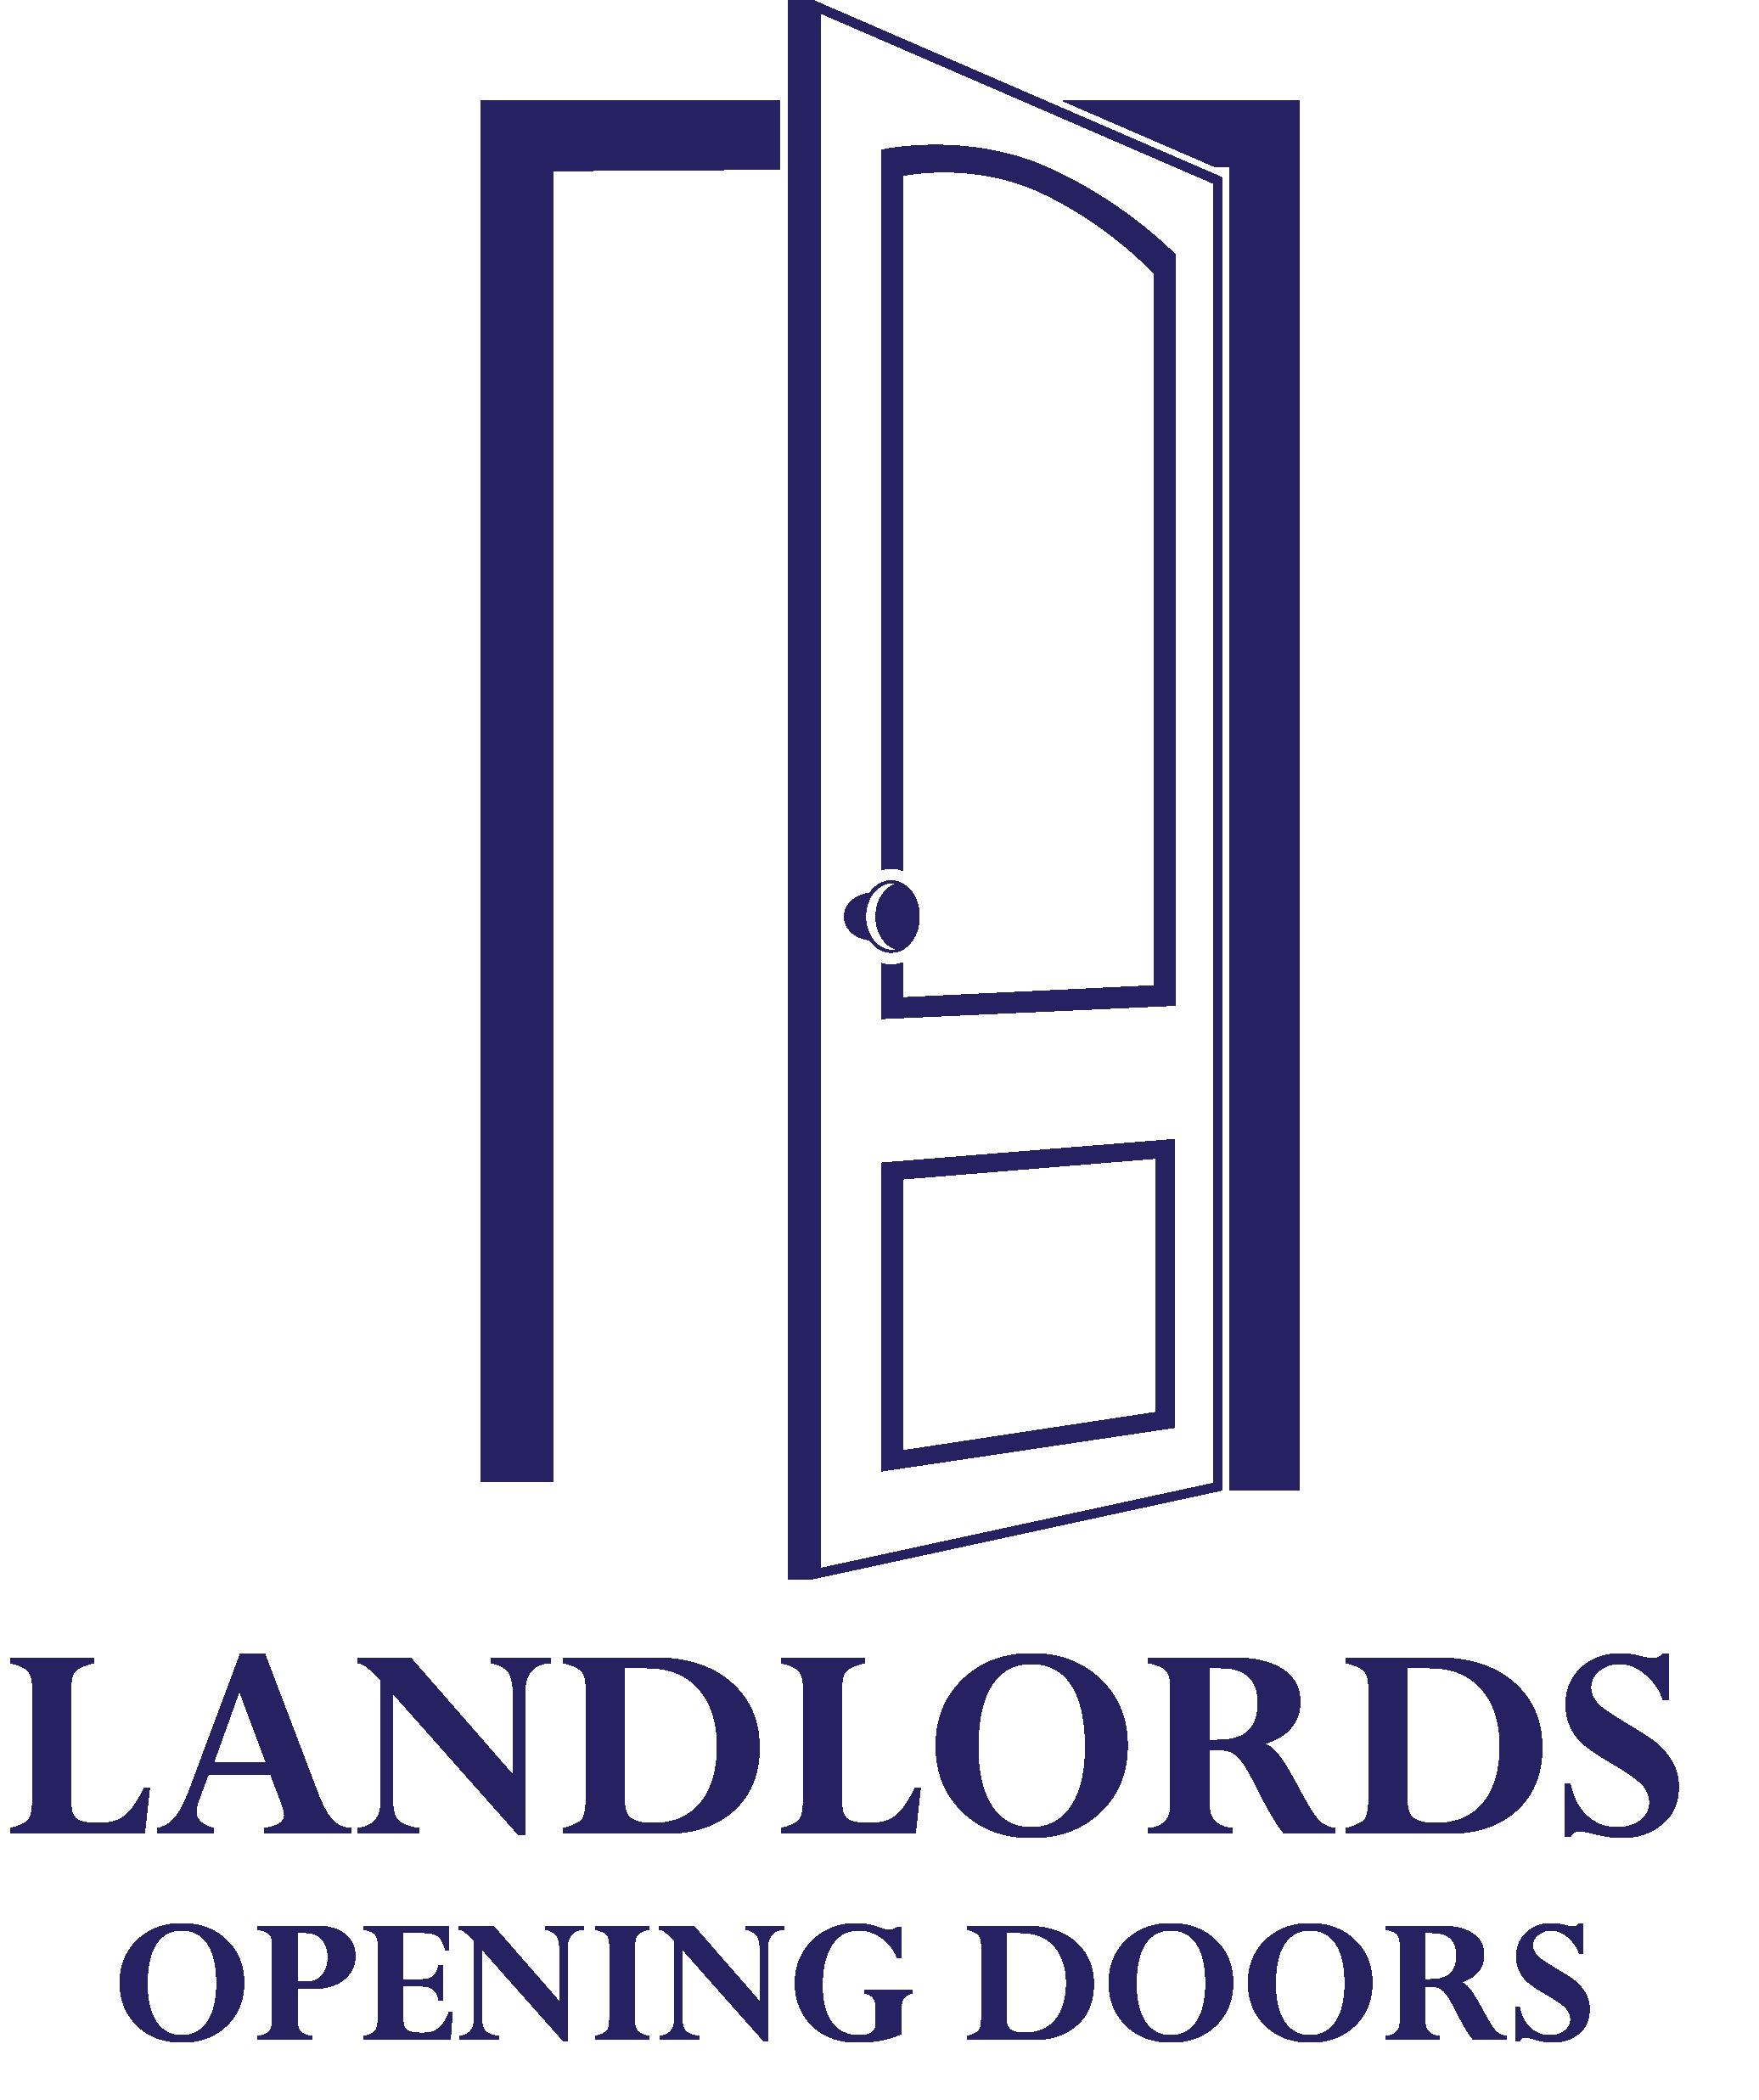 landlordsopeningdoorsplain.png